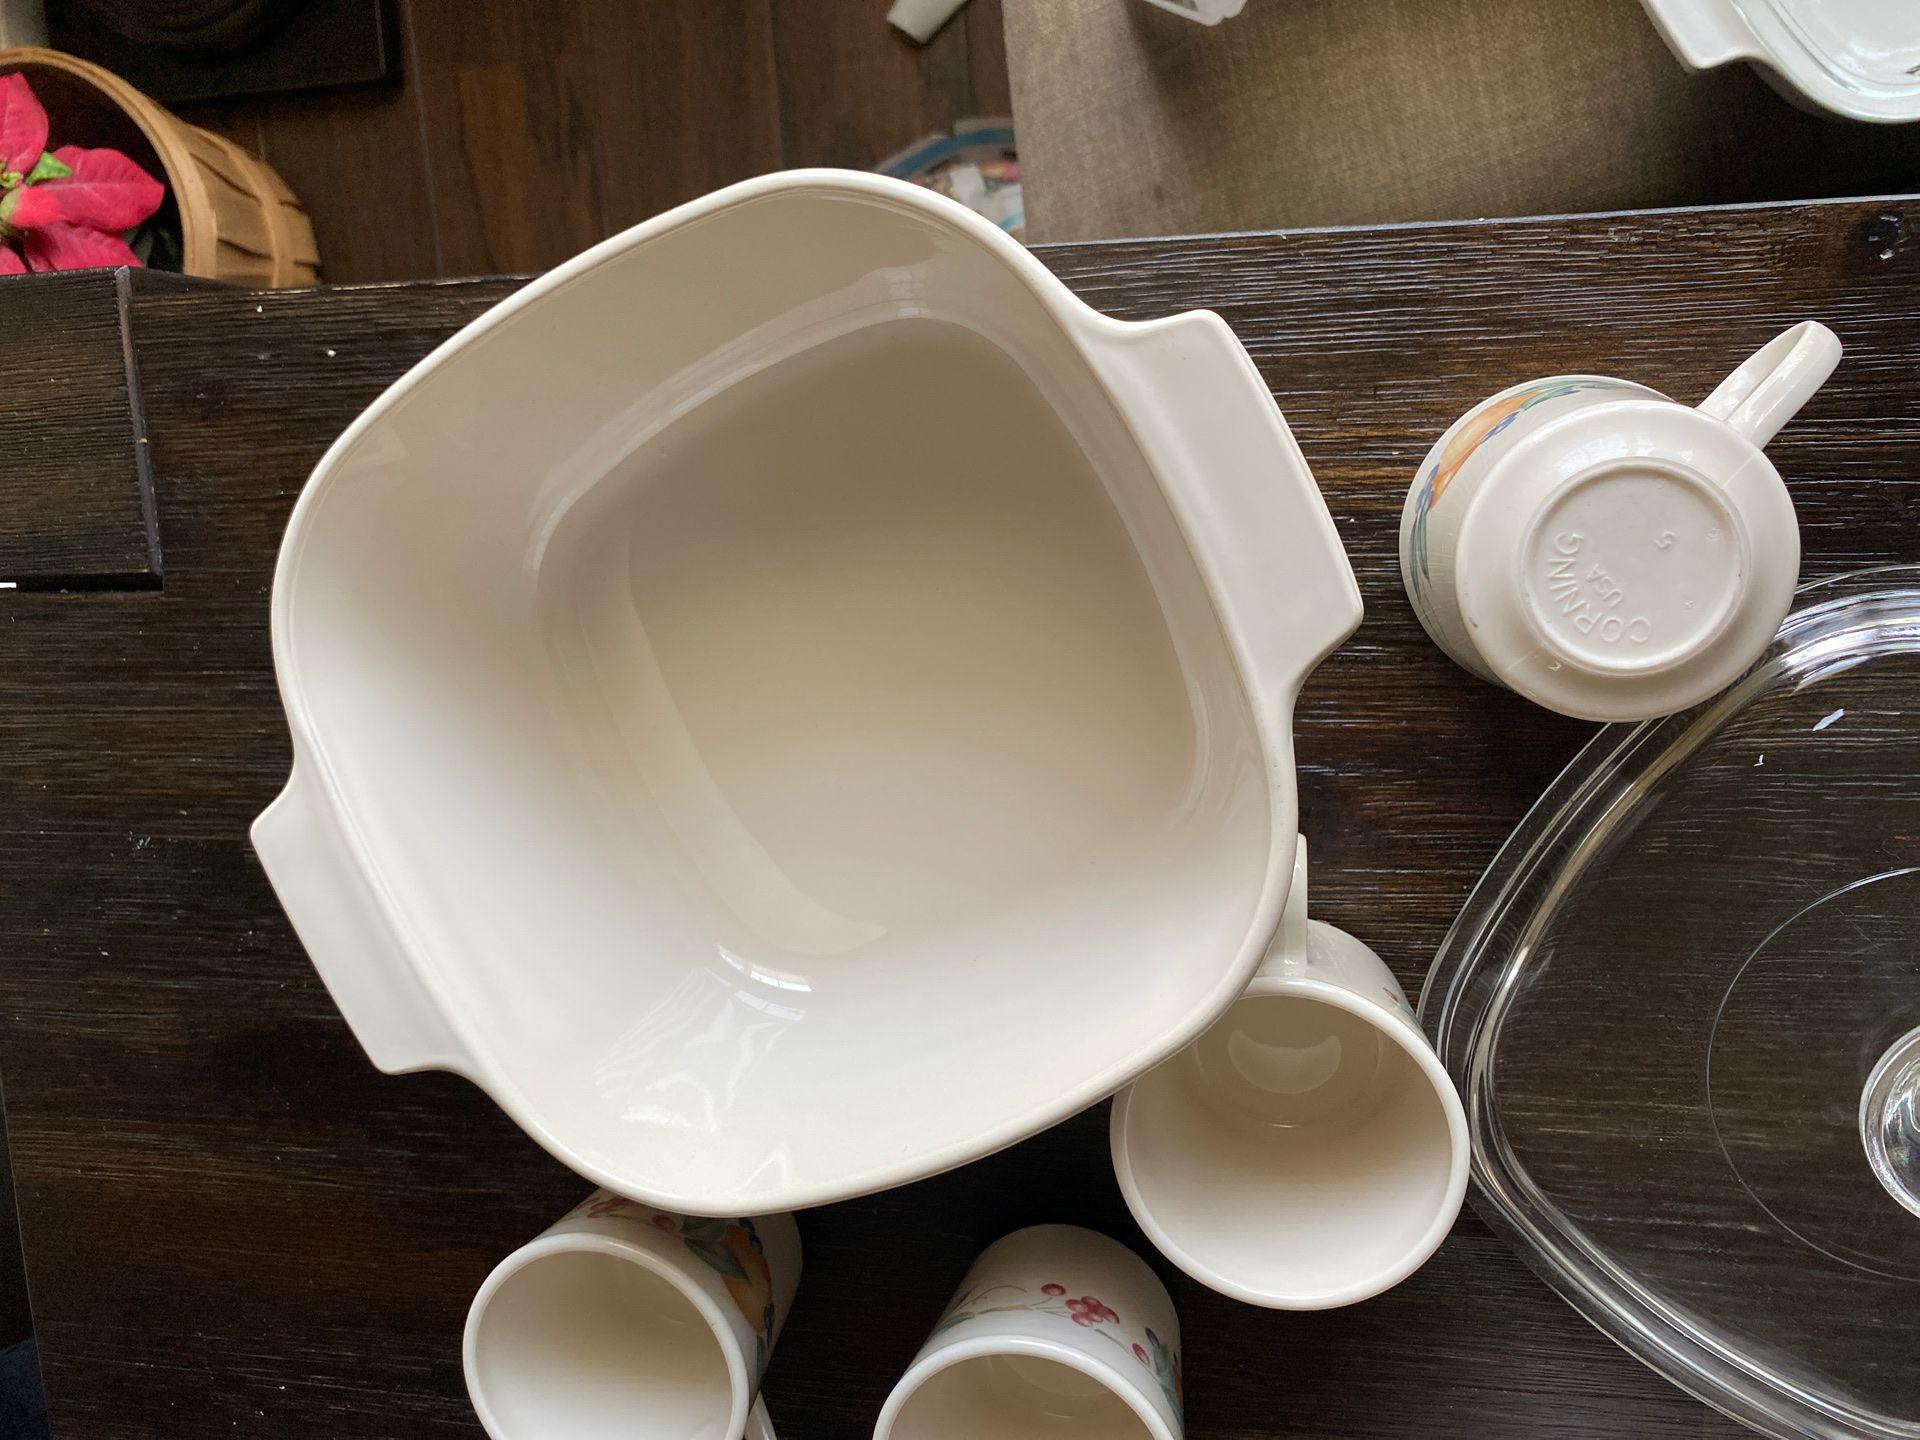 Corningware set